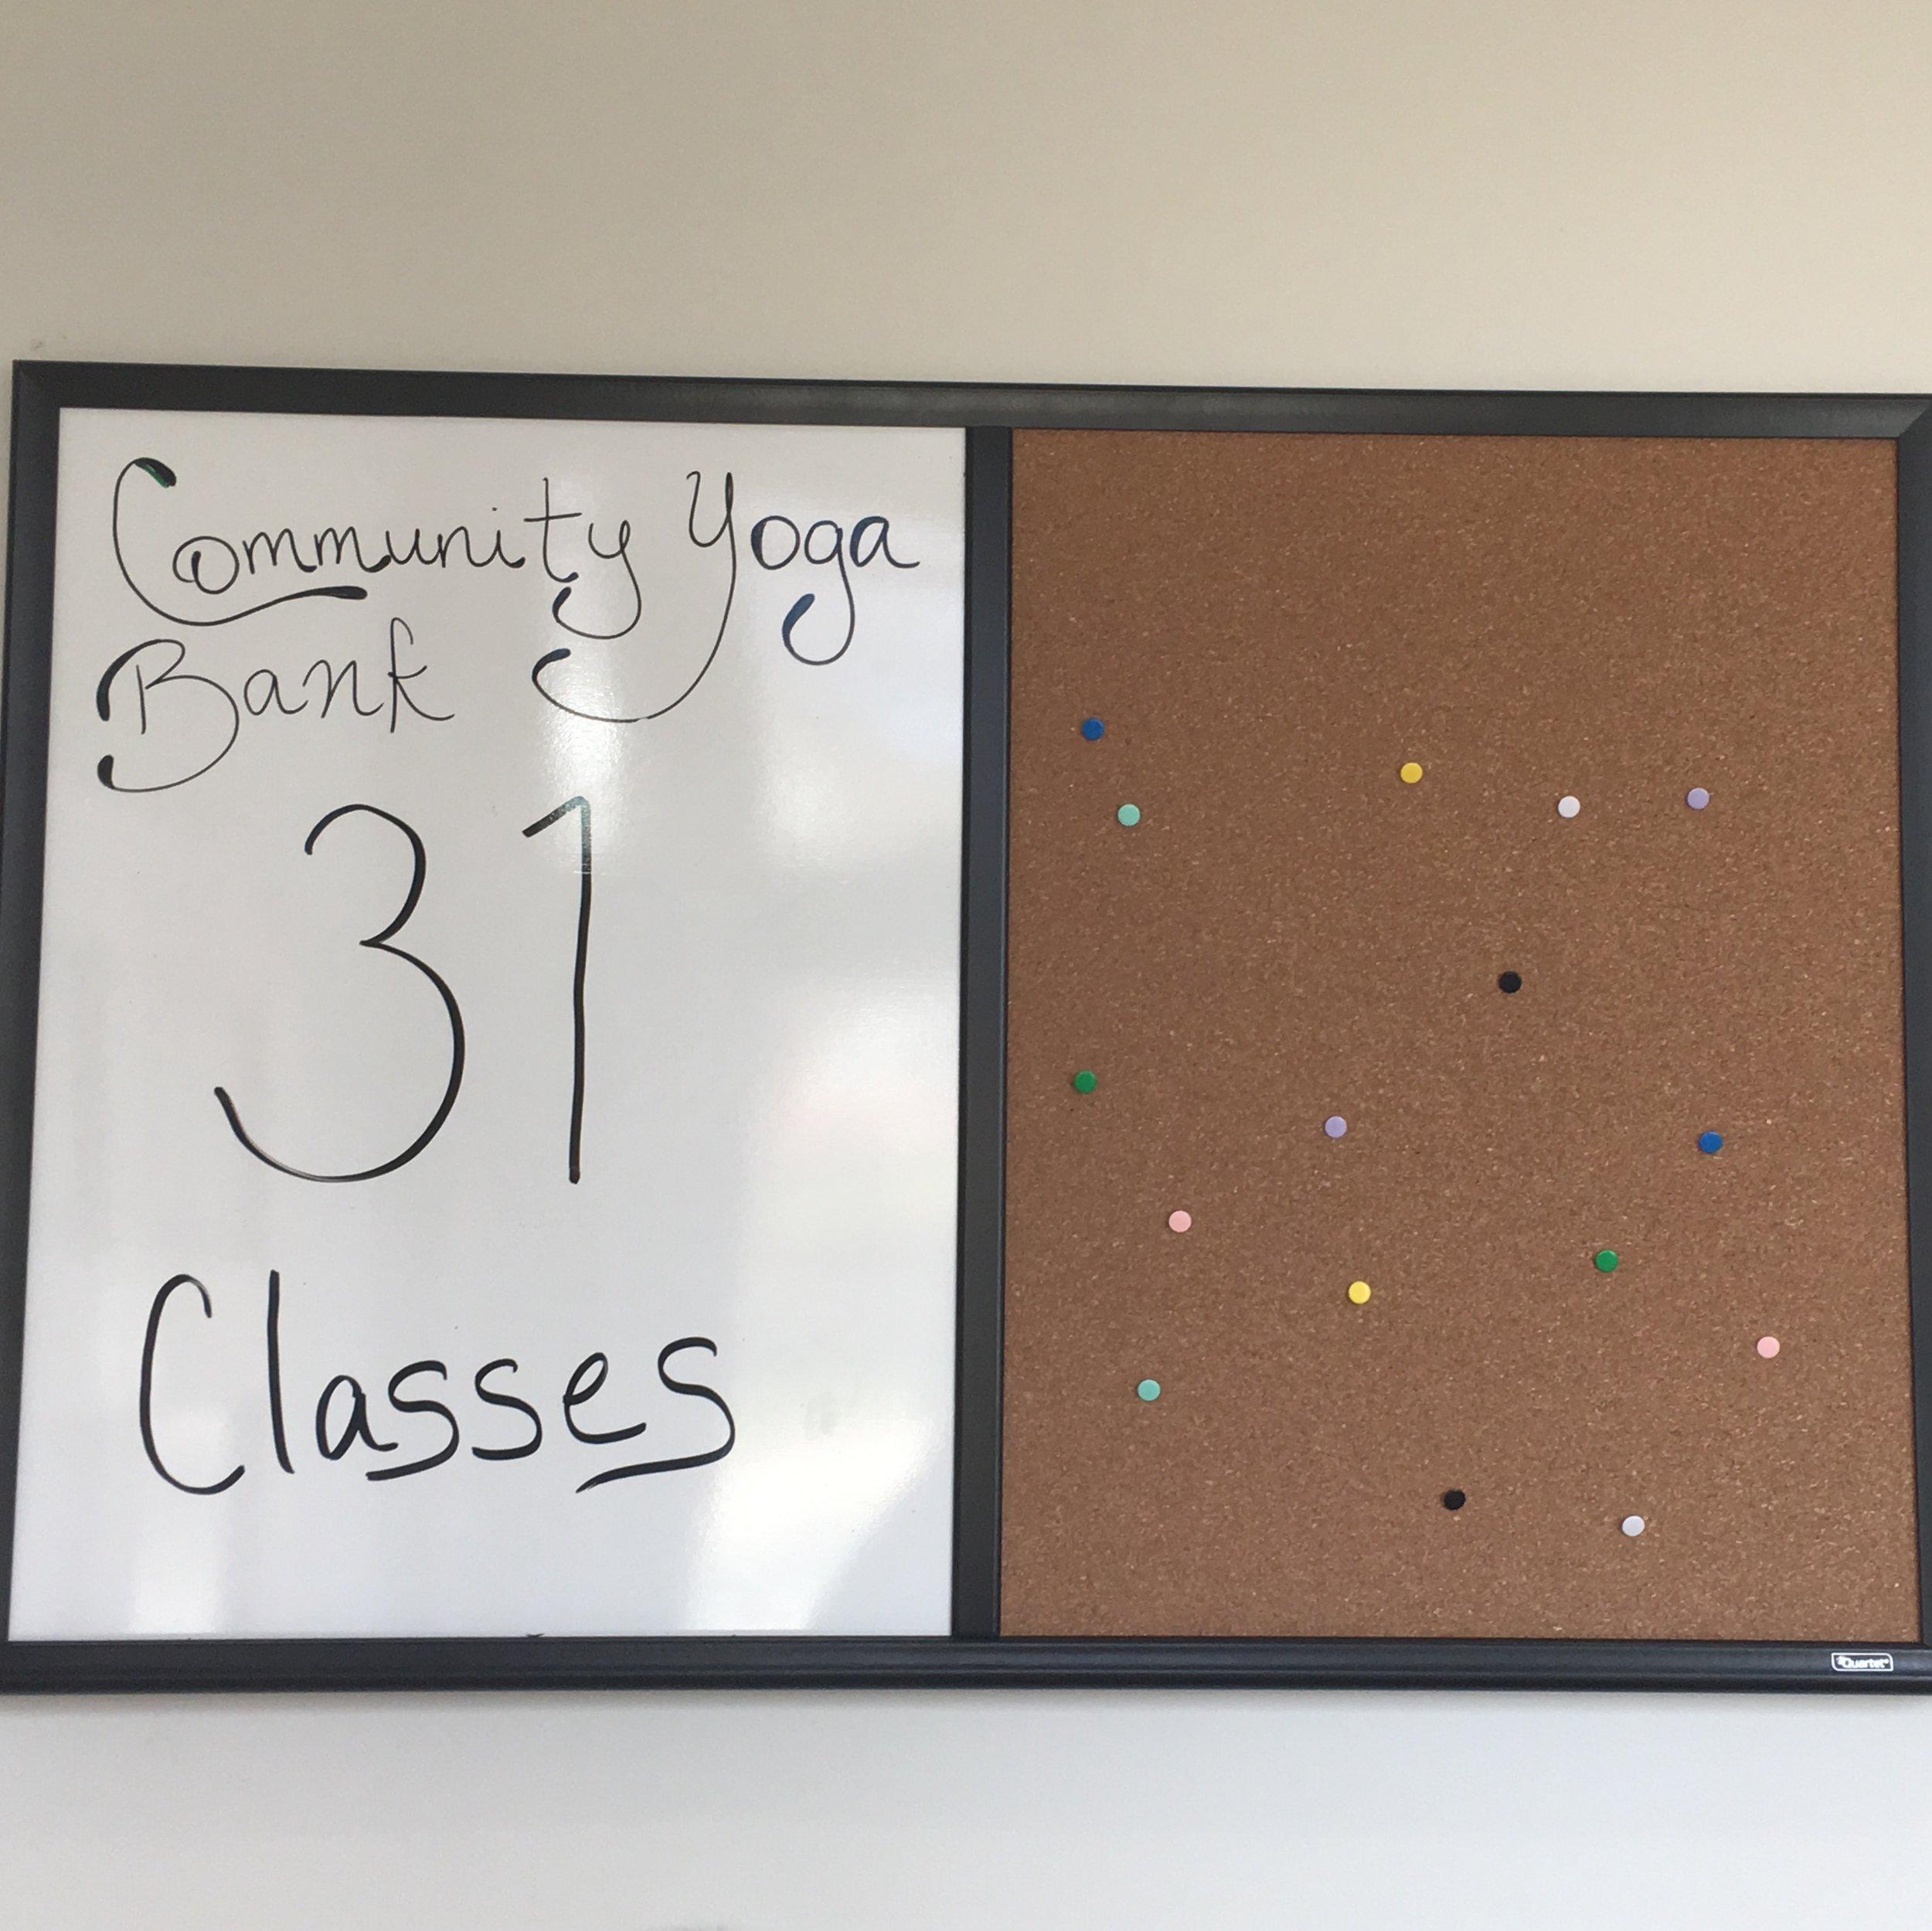 Yoga Bank Classes